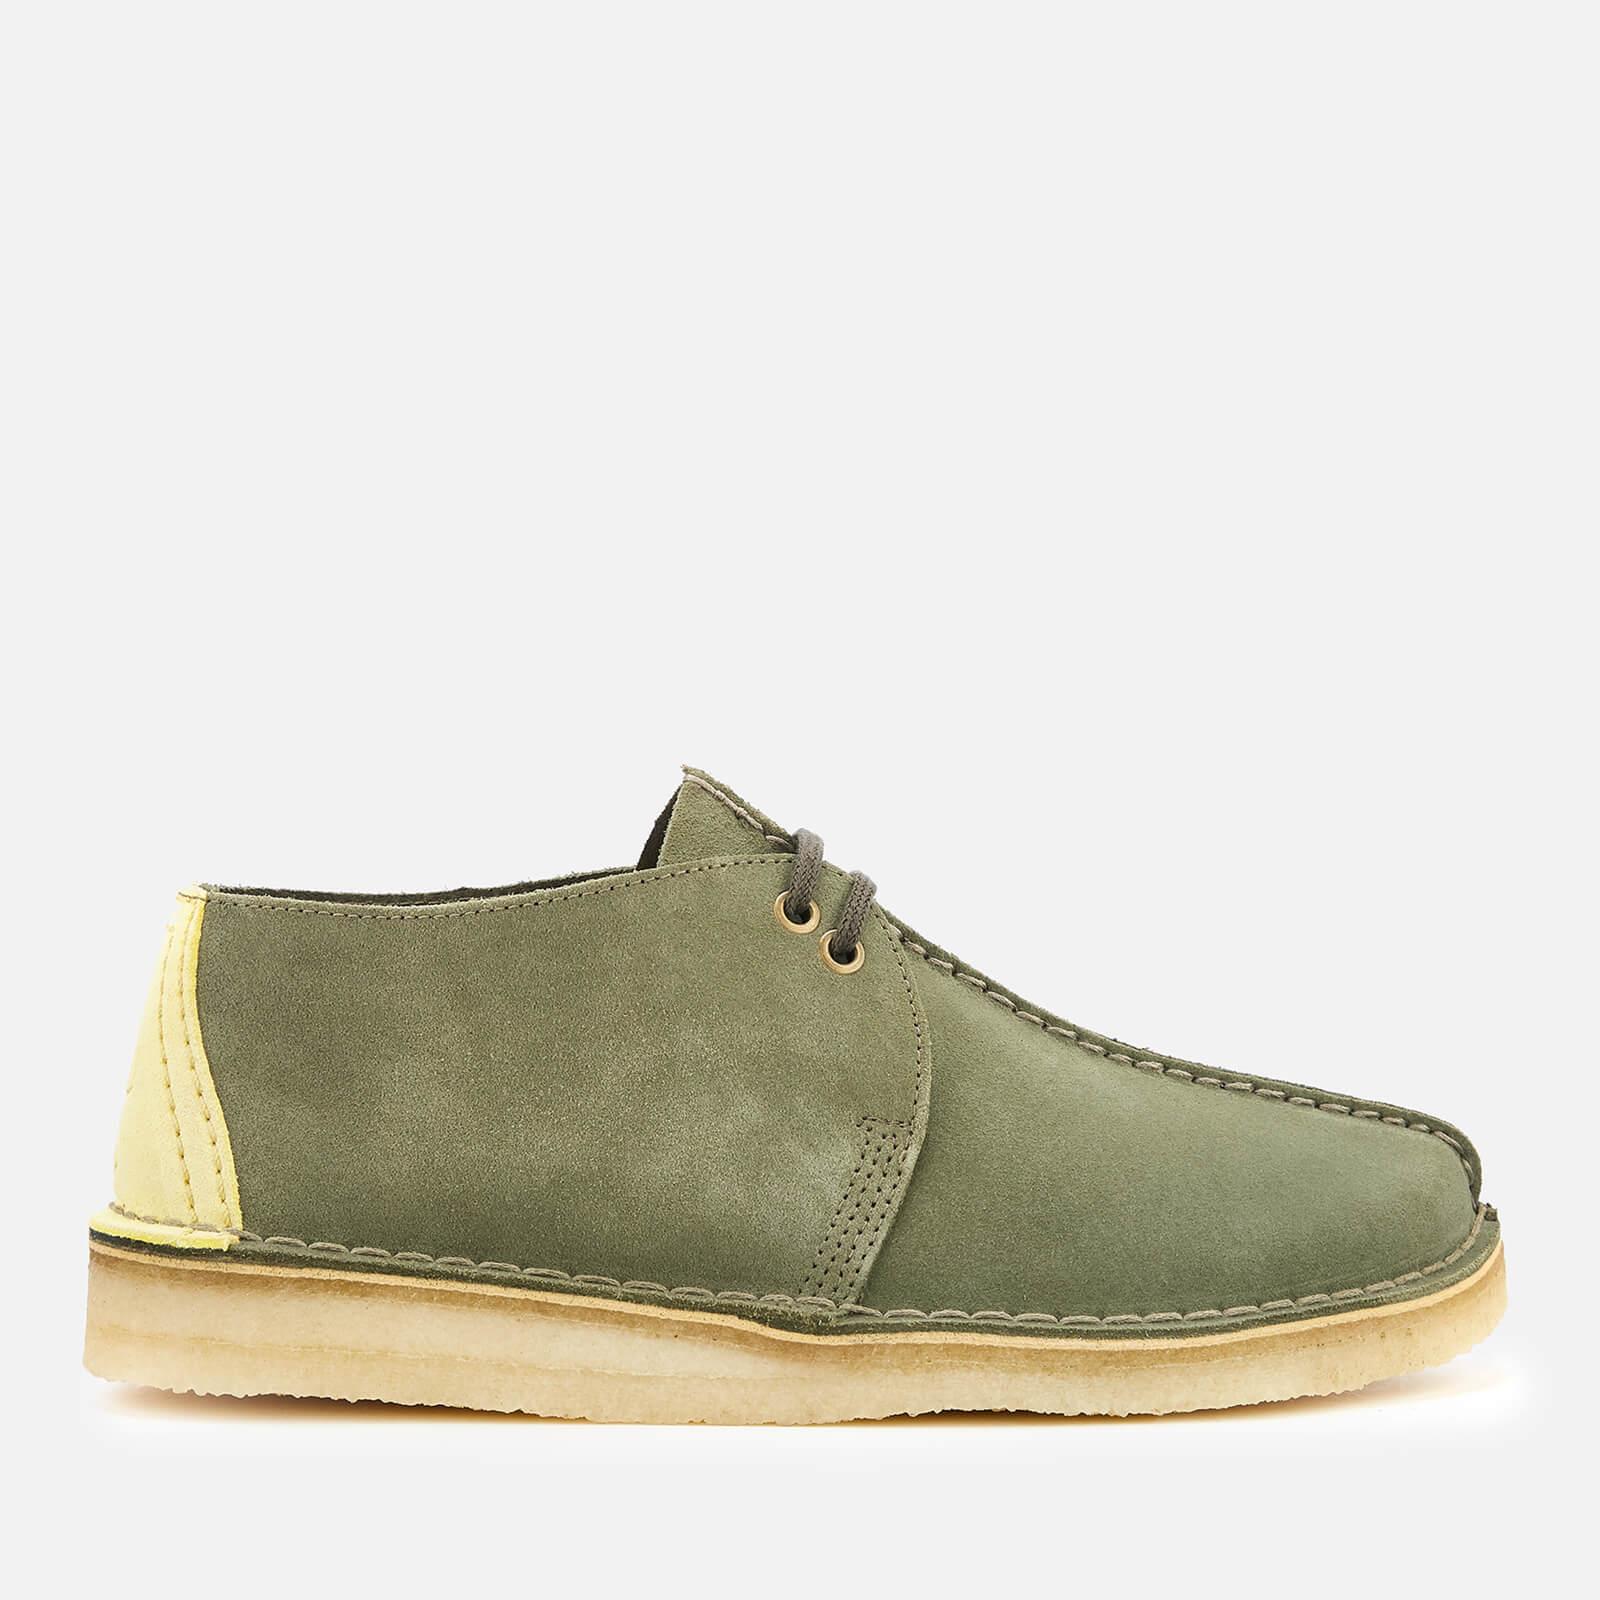 247e37ee1833dc Clarks Originals Men s Desert Trek Suede Shoes - Sage Clothing ...